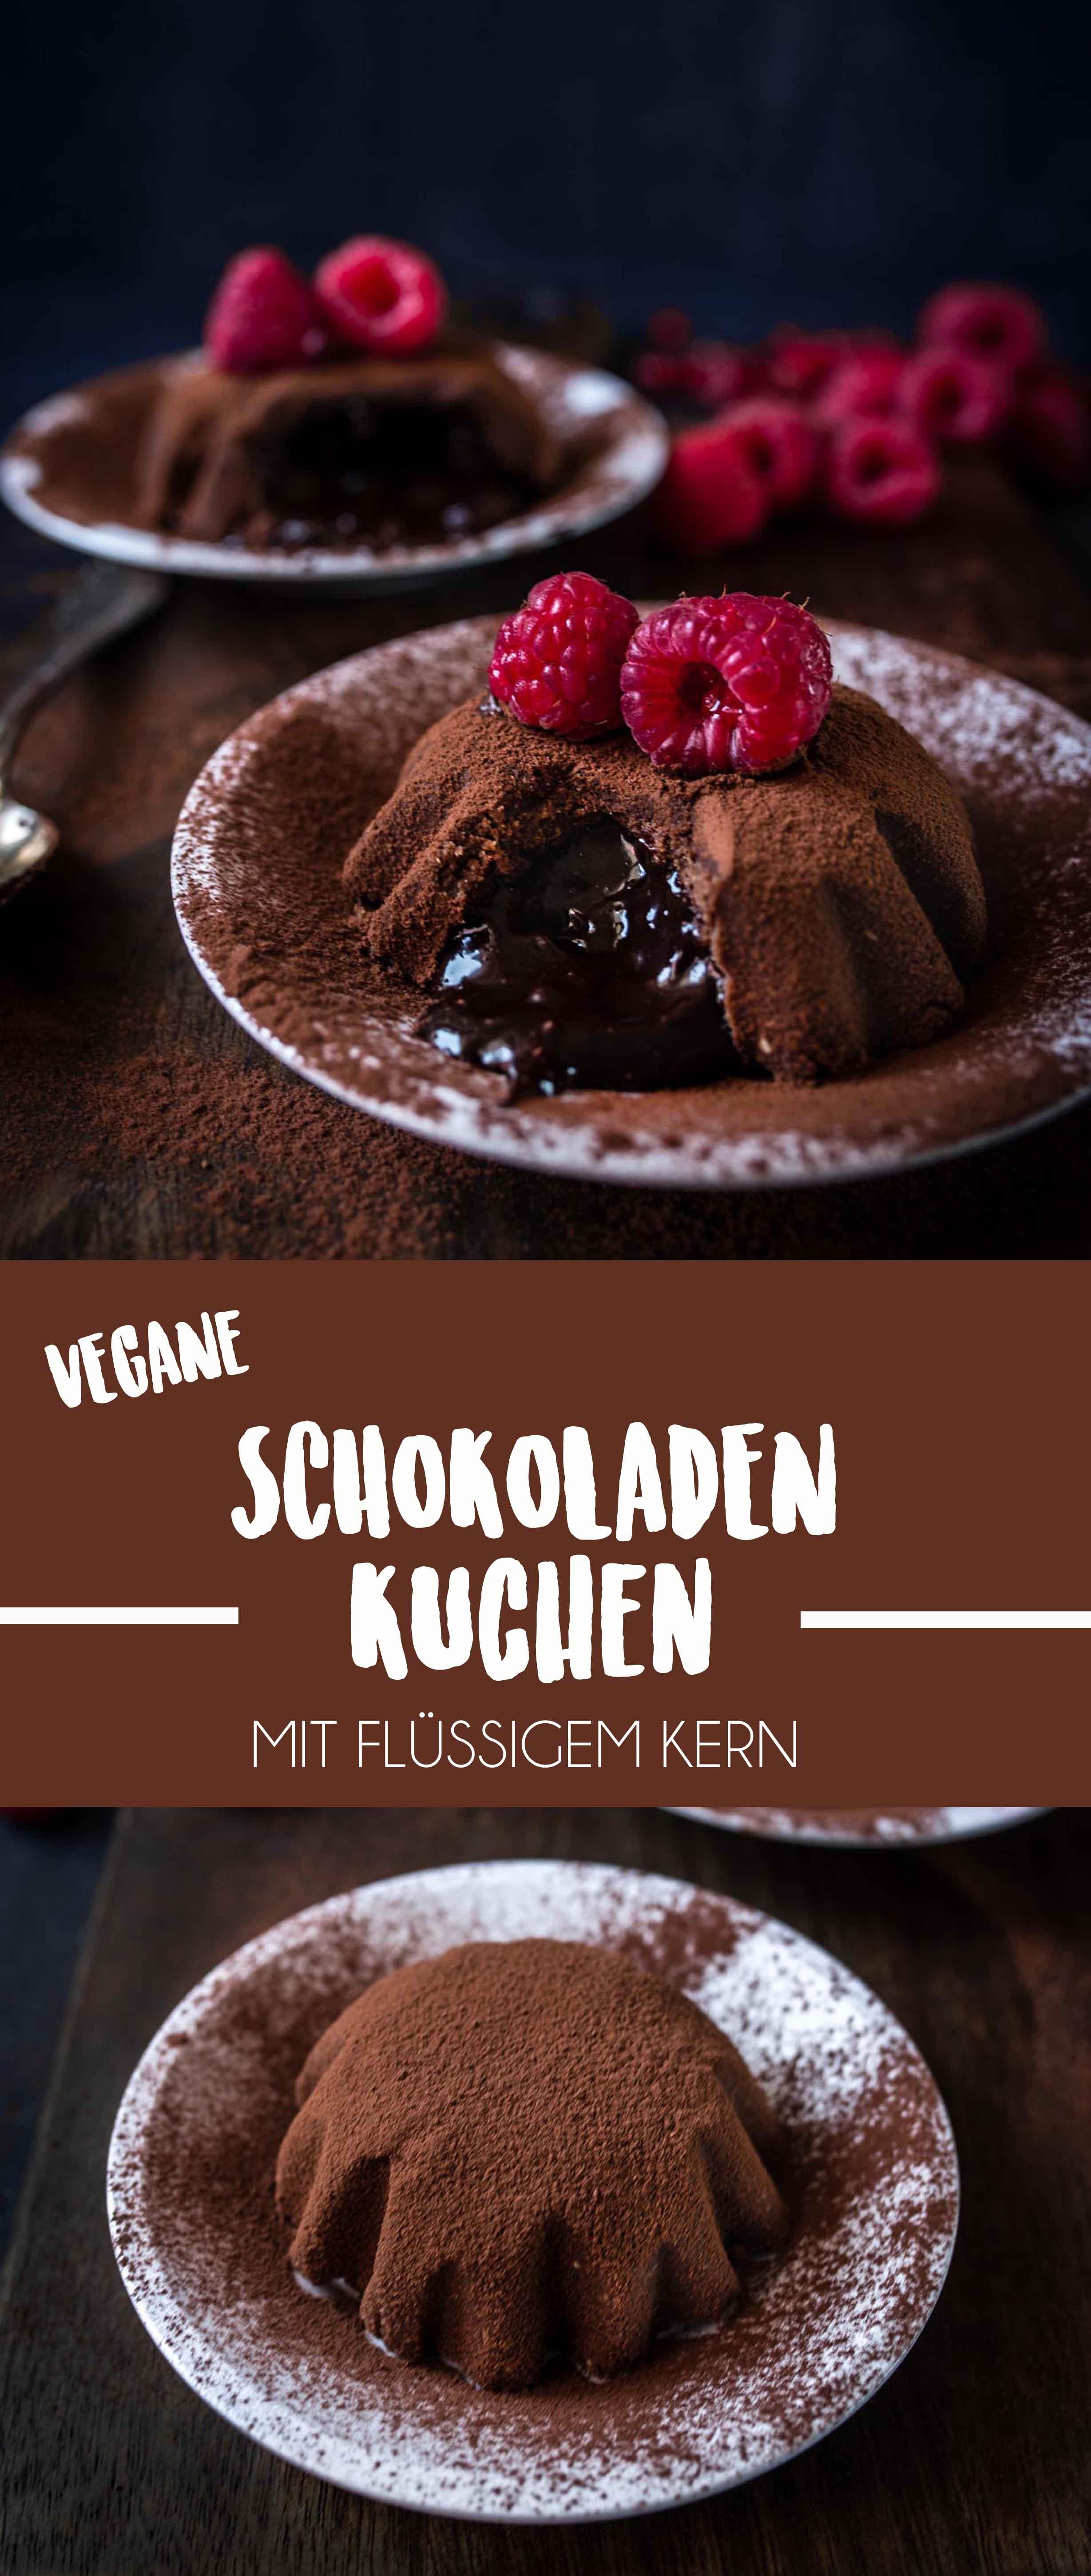 Vegan Chocolate Cakes with a luscious liquid center